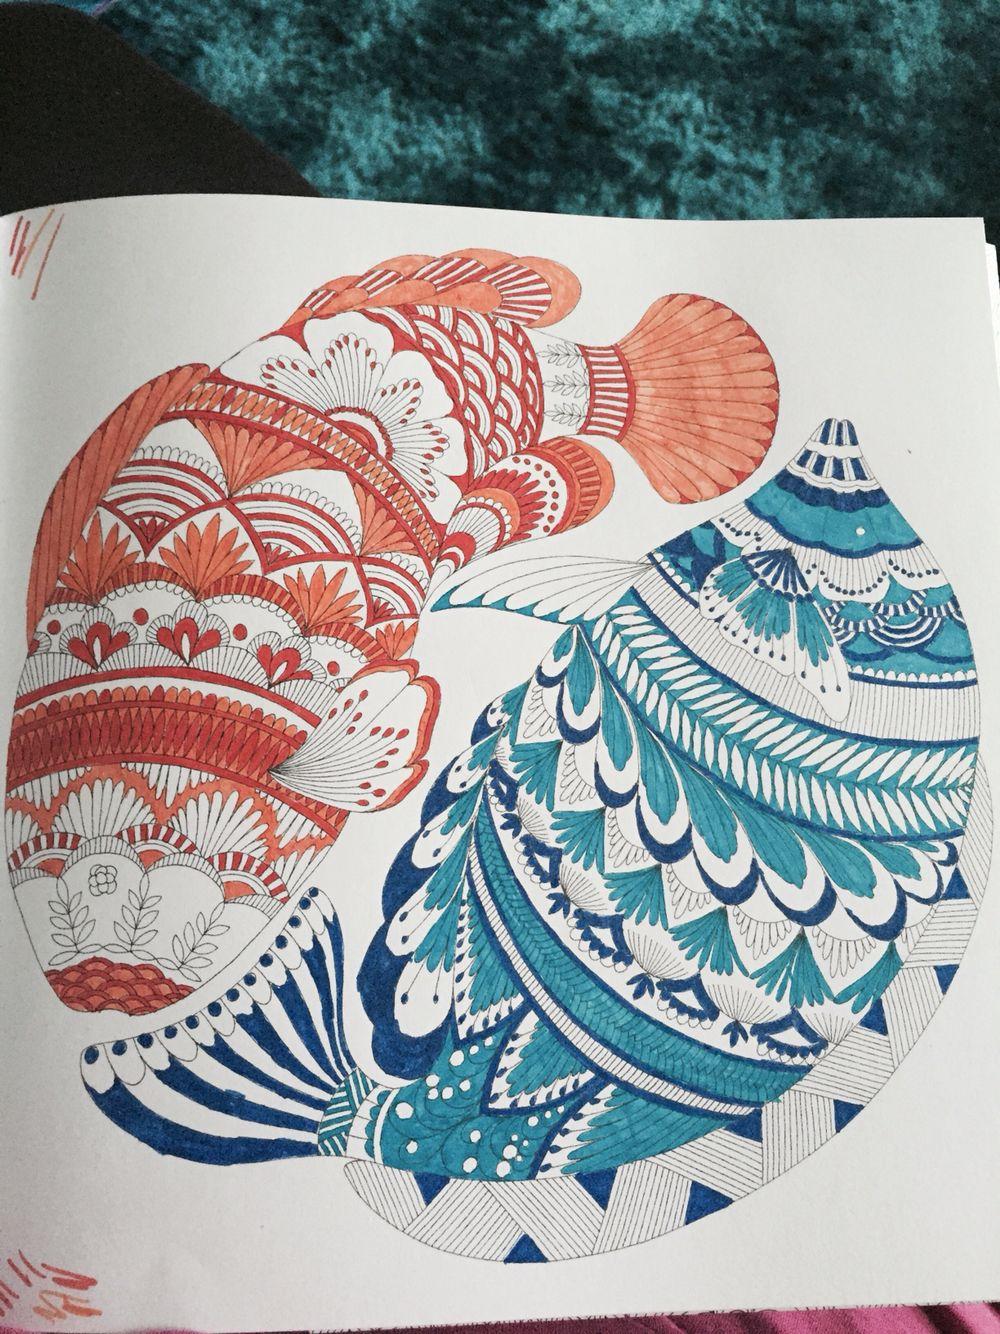 Fish From Millie Marotta S Animal Kingdom Colouring Book Animal Kingdom Colouring Book Millie Marotta Animal Kingdom Millie Marotta Coloring Book